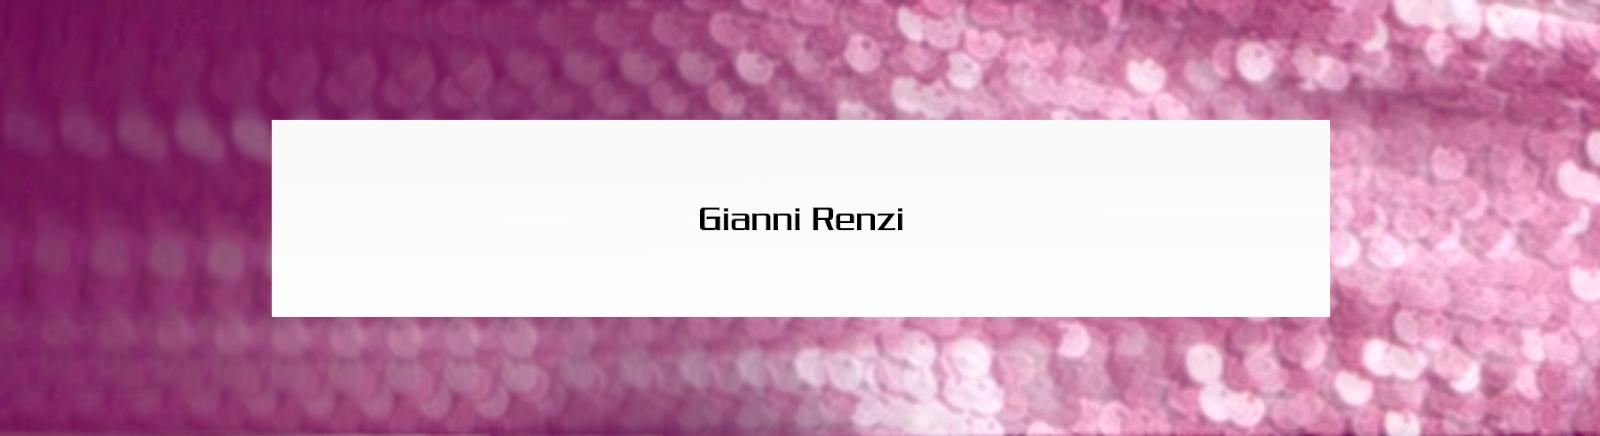 Gianni Renzi Markenschuhe online bestellen im Prange Schuhe Shop